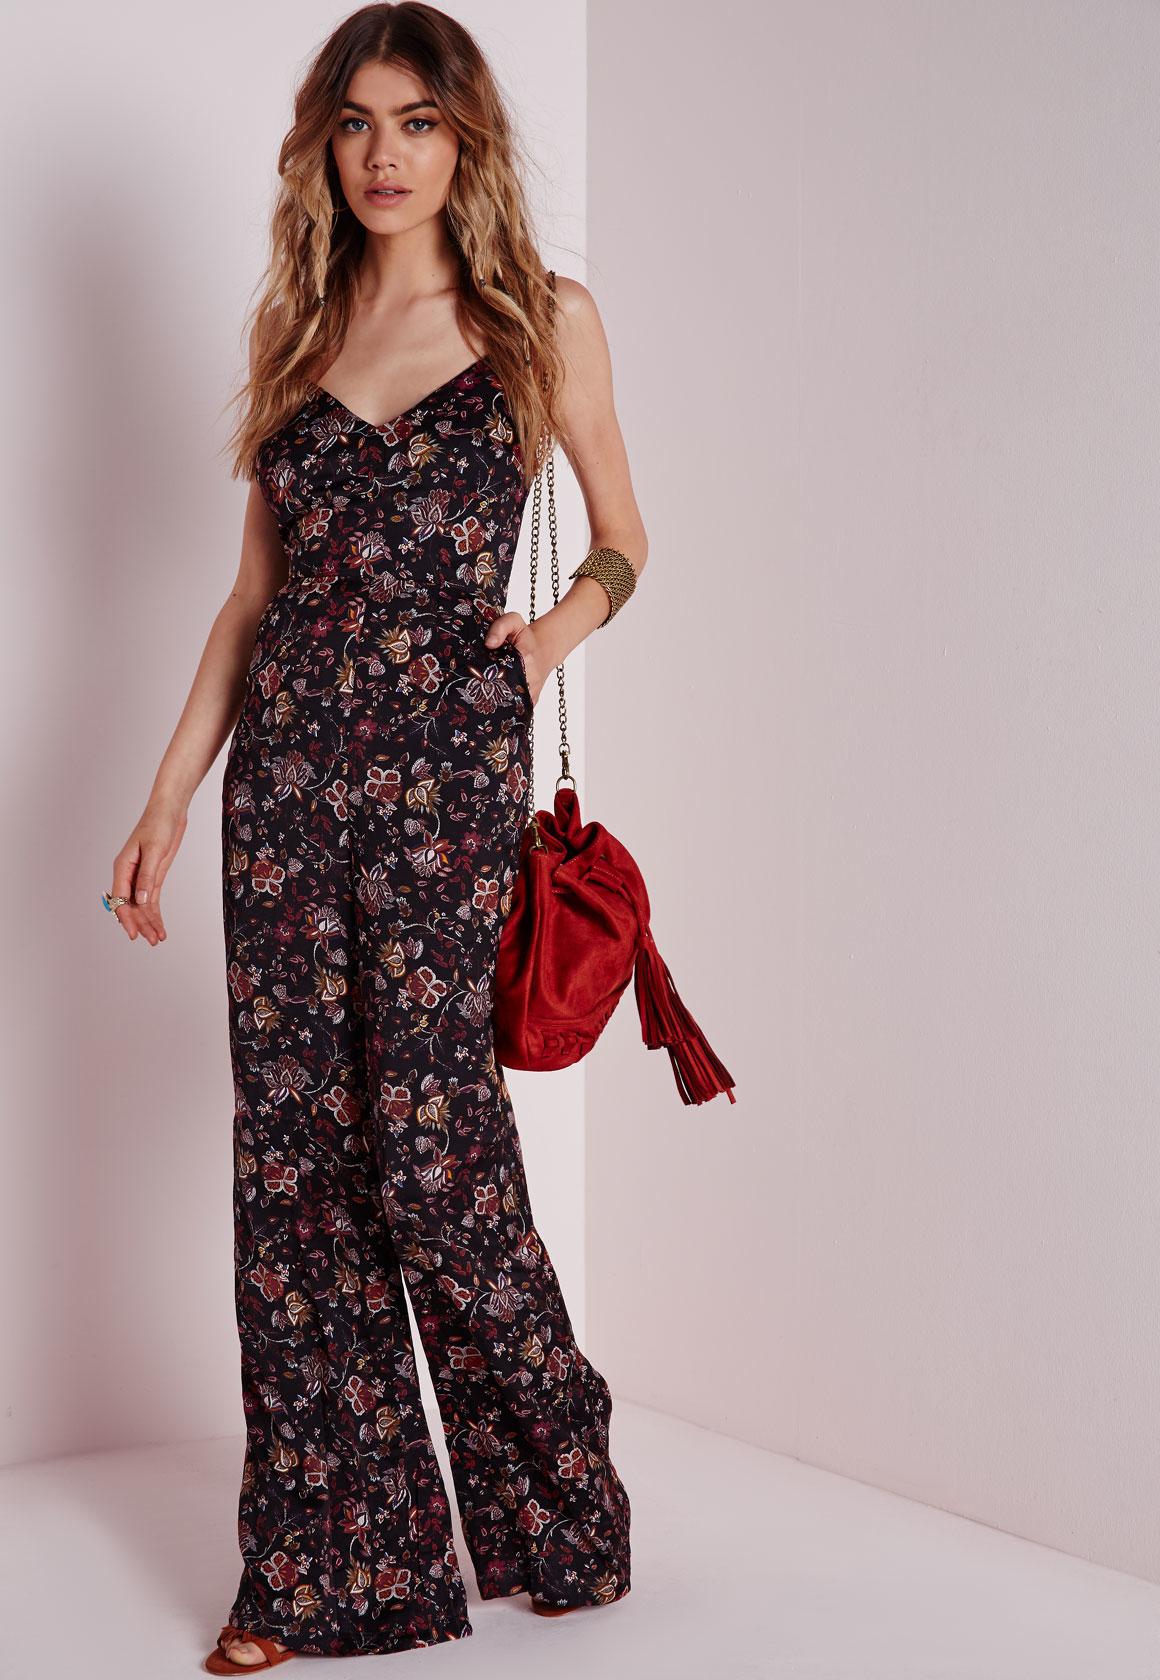 b430d8204e6a Lyst - Missguided Strappy Floral Wide Leg Jumpsuit Black